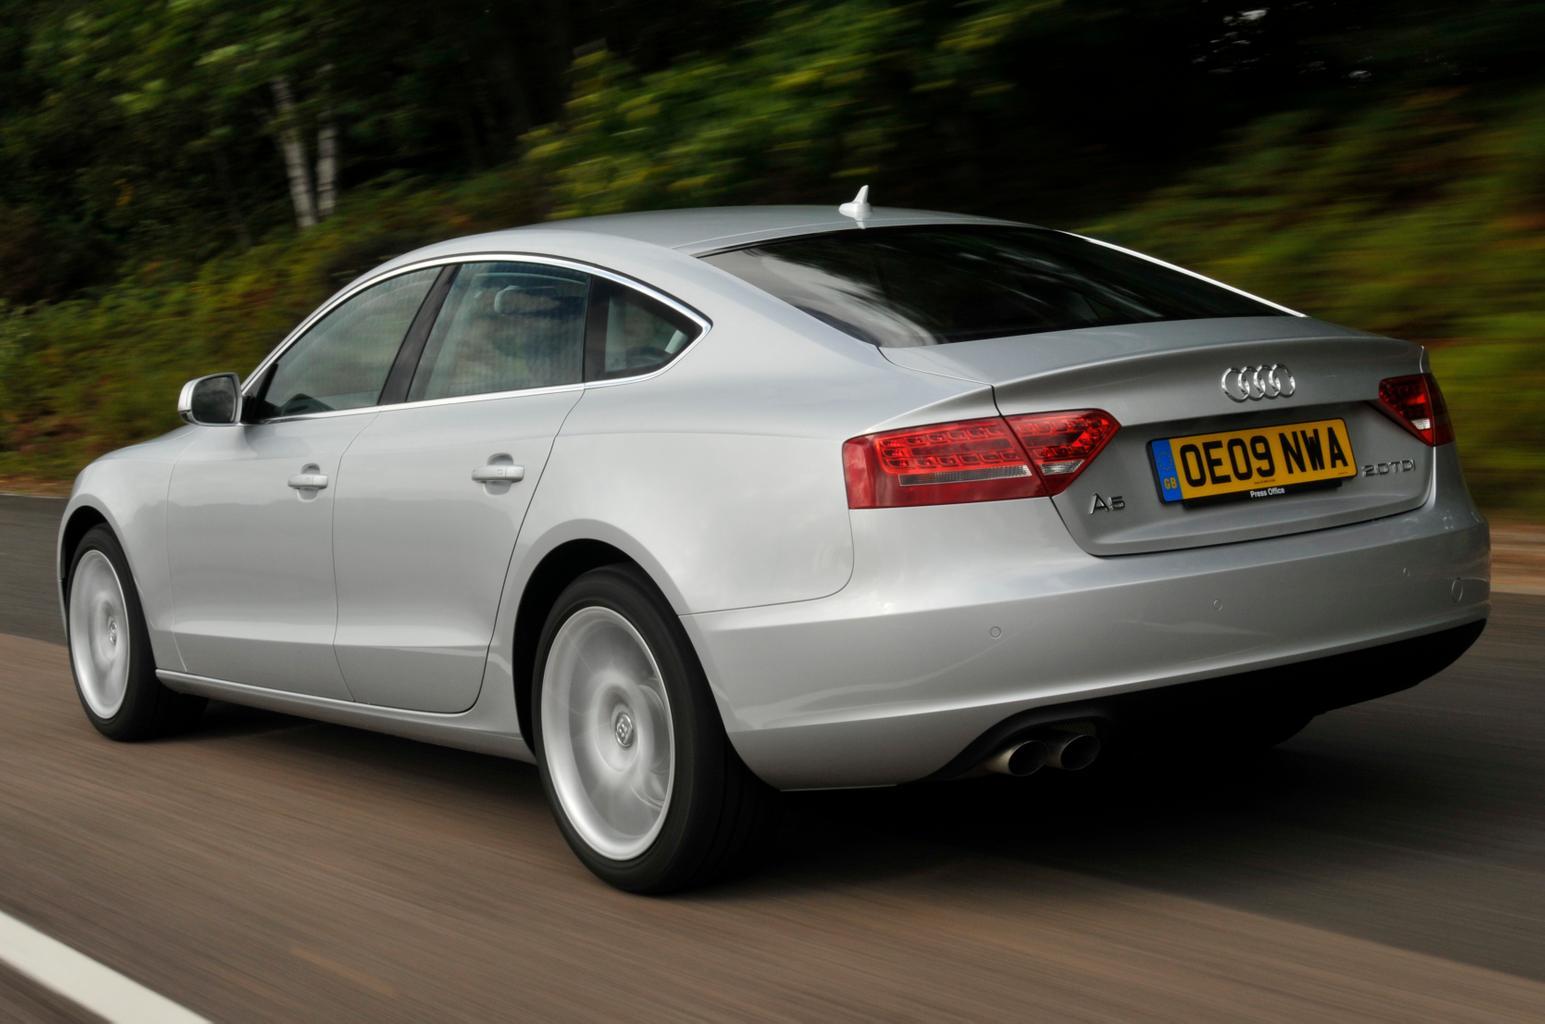 Used test: Audi A5 Sportback vs BMW 3 Series vs Mercedes C-class vs Volkswagen Passat CC